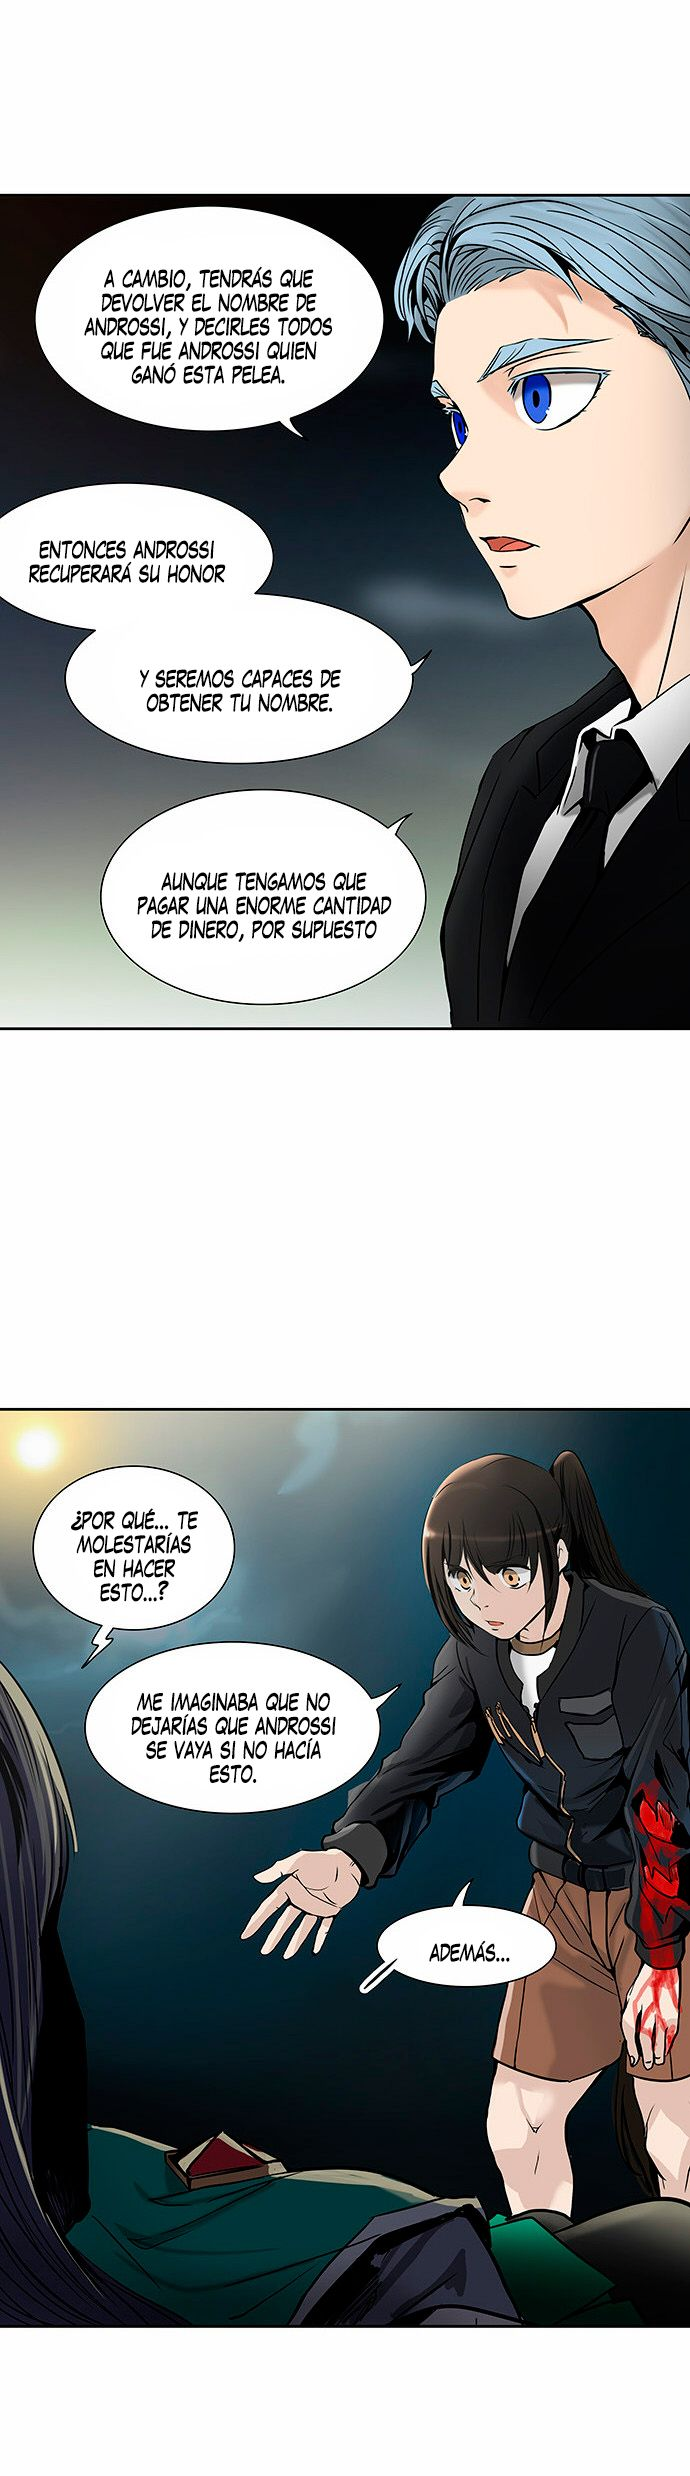 https://c5.ninemanga.com/es_manga/pic2/21/149/512547/c2f36d2c5b0275f02b88264fe029e9ca.jpg Page 15